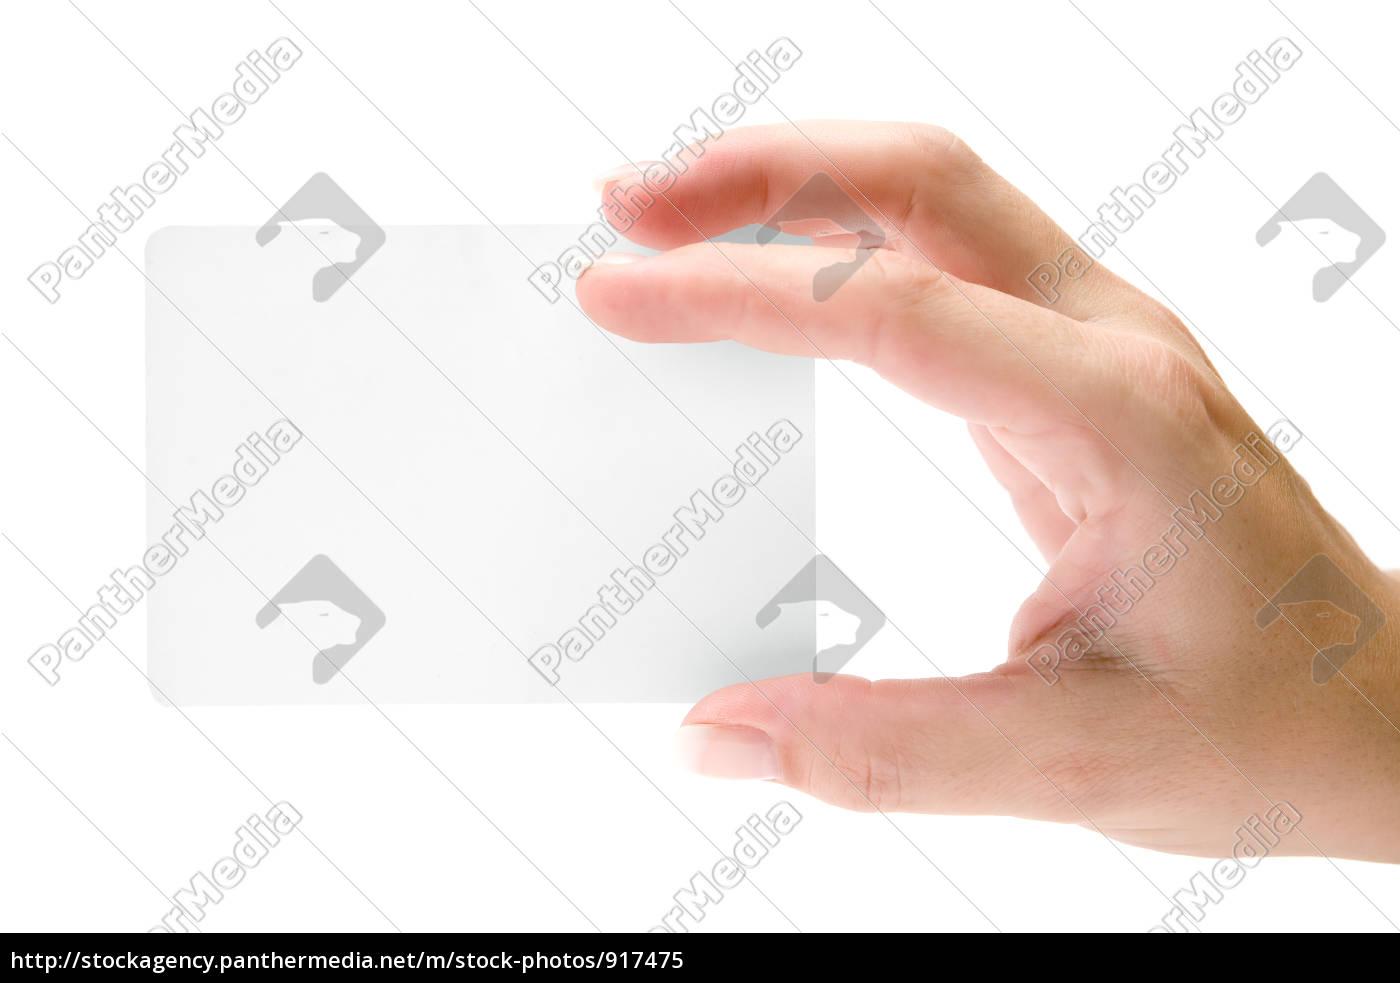 Stockfoto 917475 Leere Visitenkarte